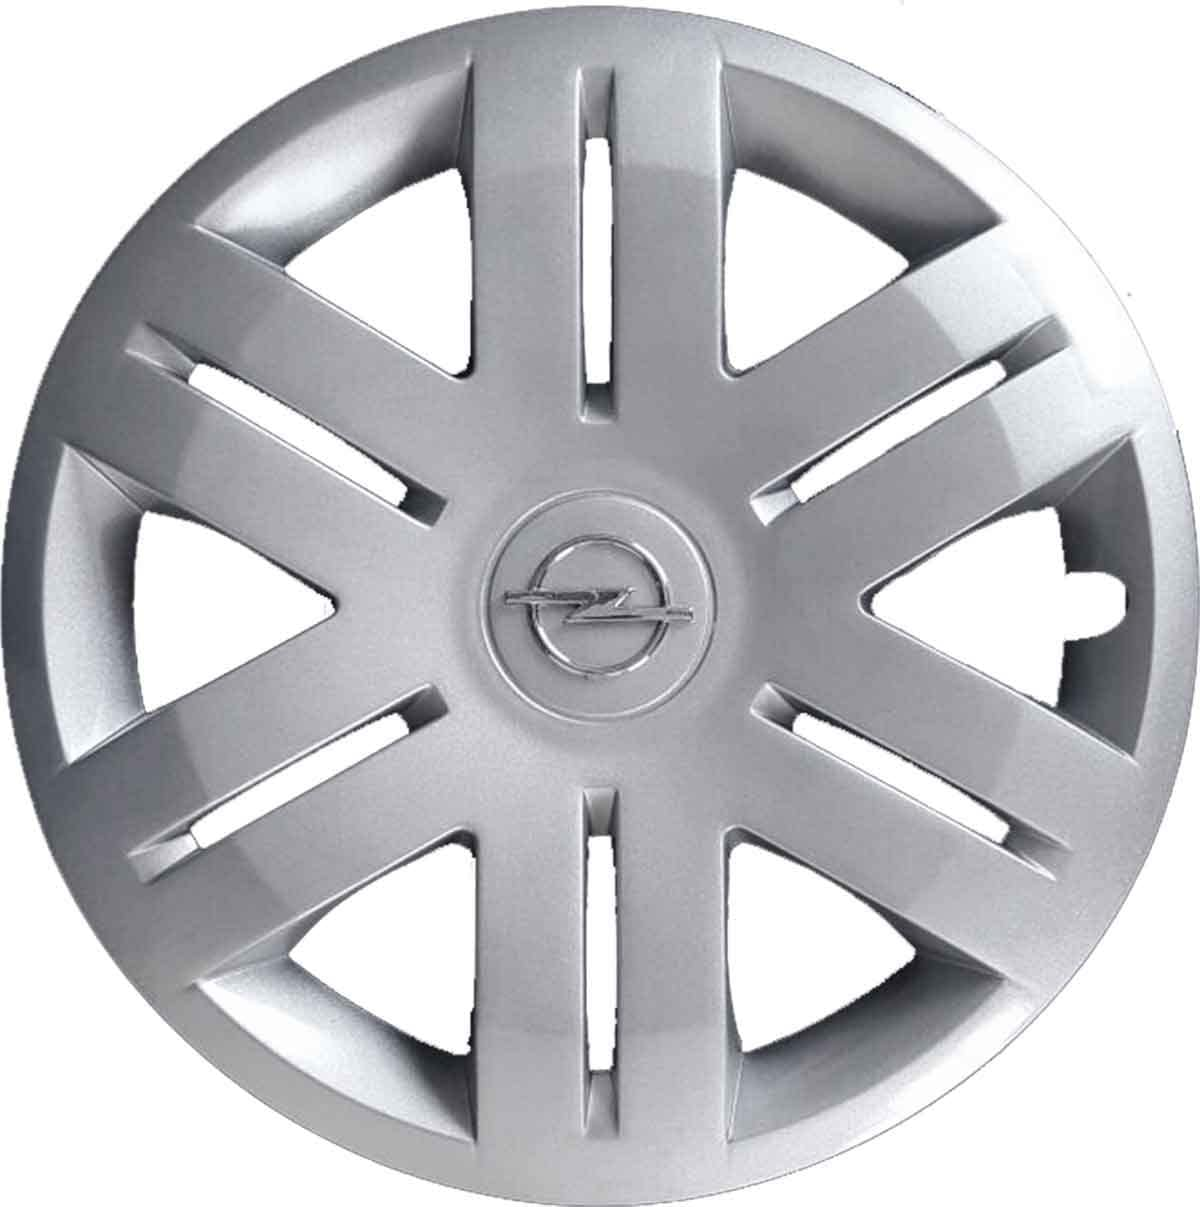 Generico Opel VIVARO COPRICERCHIO BORCHIA Quattro cod 4 5912//6 Diametro 16 Logo Cromato